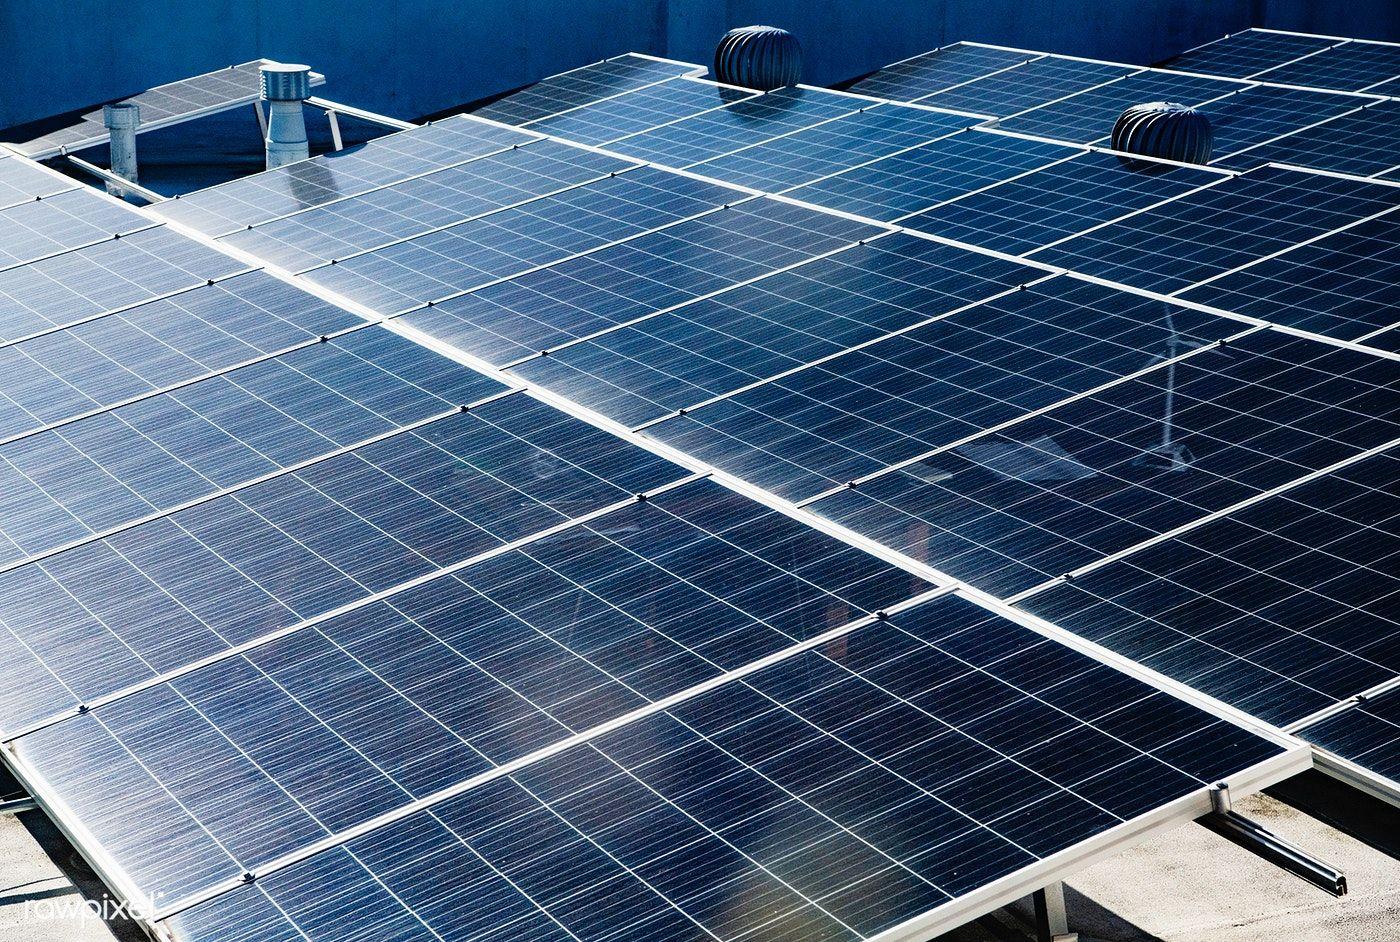 Closeup Of Photovoltaic Power Plants Free Image By Rawpixel Com Teddy Rawpixel Photovoltaic Solar Energy Diy Free Solar Panels